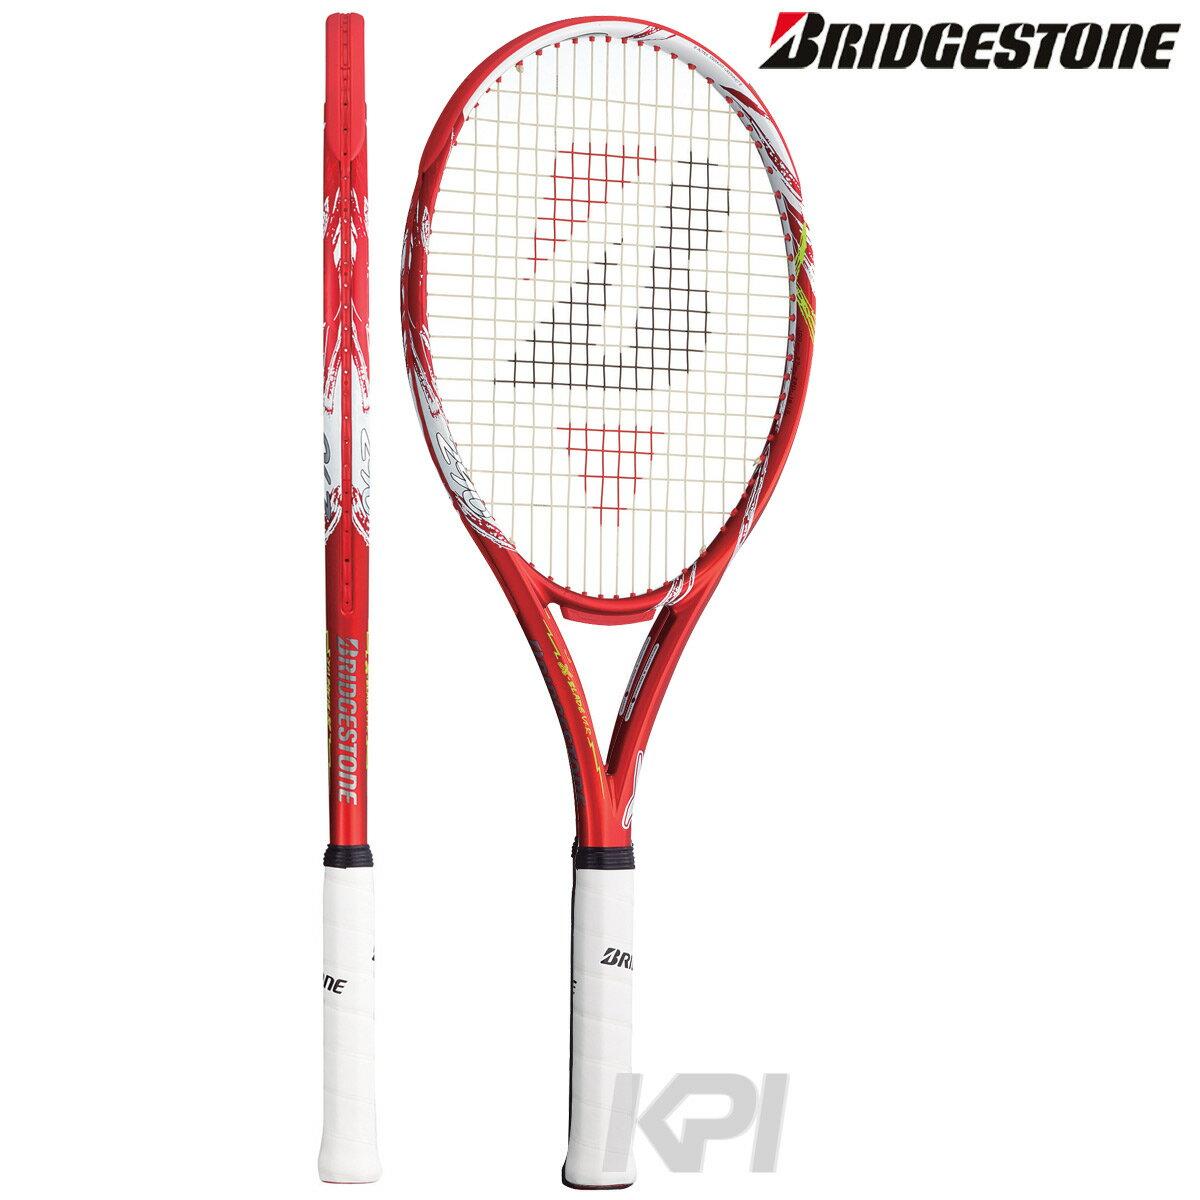 BRIDGESTONE(ブリヂストン)「X-BLADE VI-R290(エックスブレードブイアイR290) BRAV65」硬式テニスラケット【prospo】